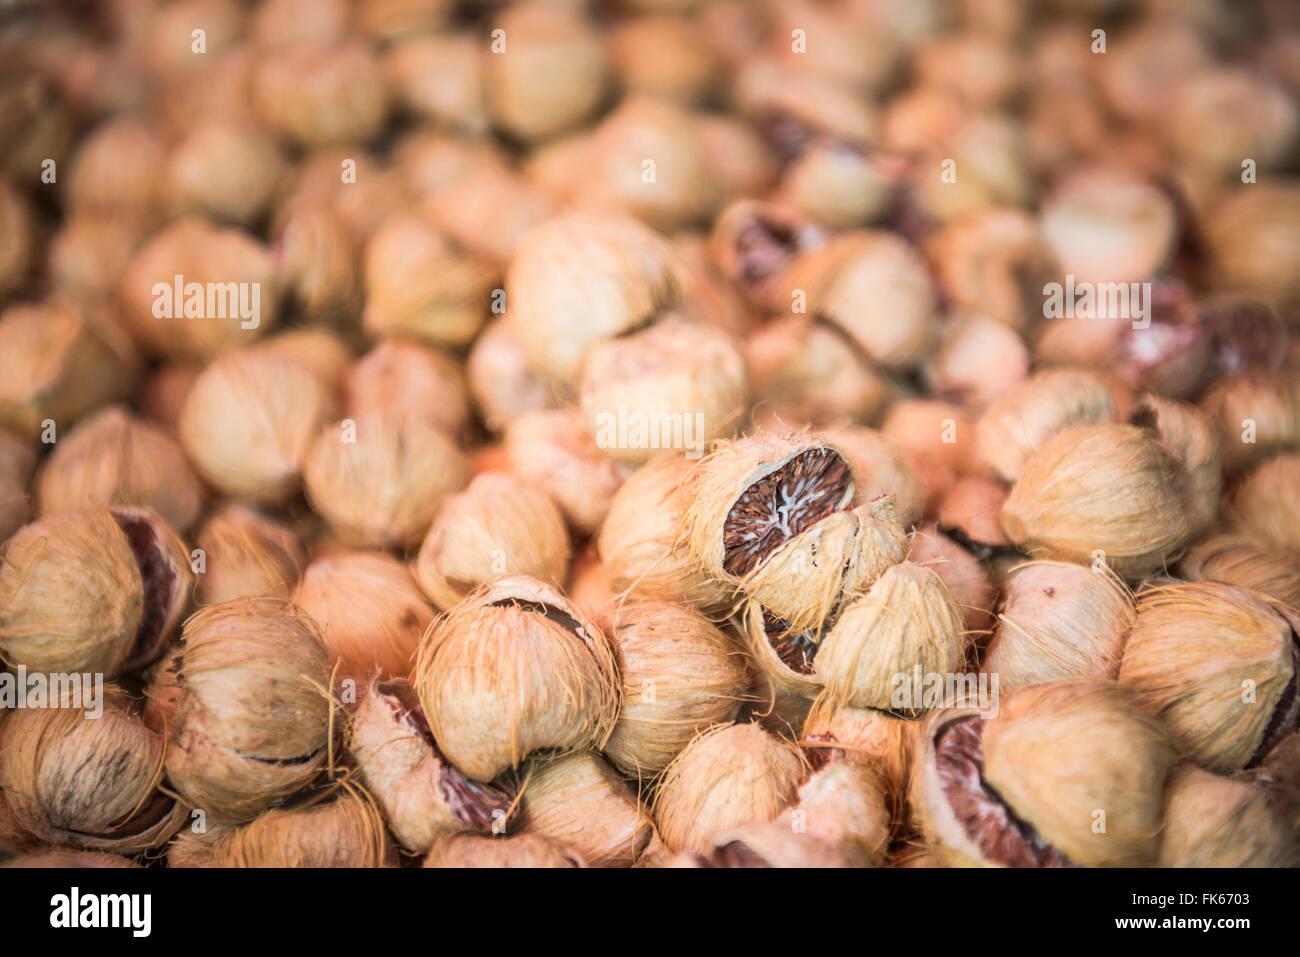 Betel nut (Betel leaf and areca nut), Mrauk U, Rakhine State, Myanmar (Burma), Asia - Stock Image